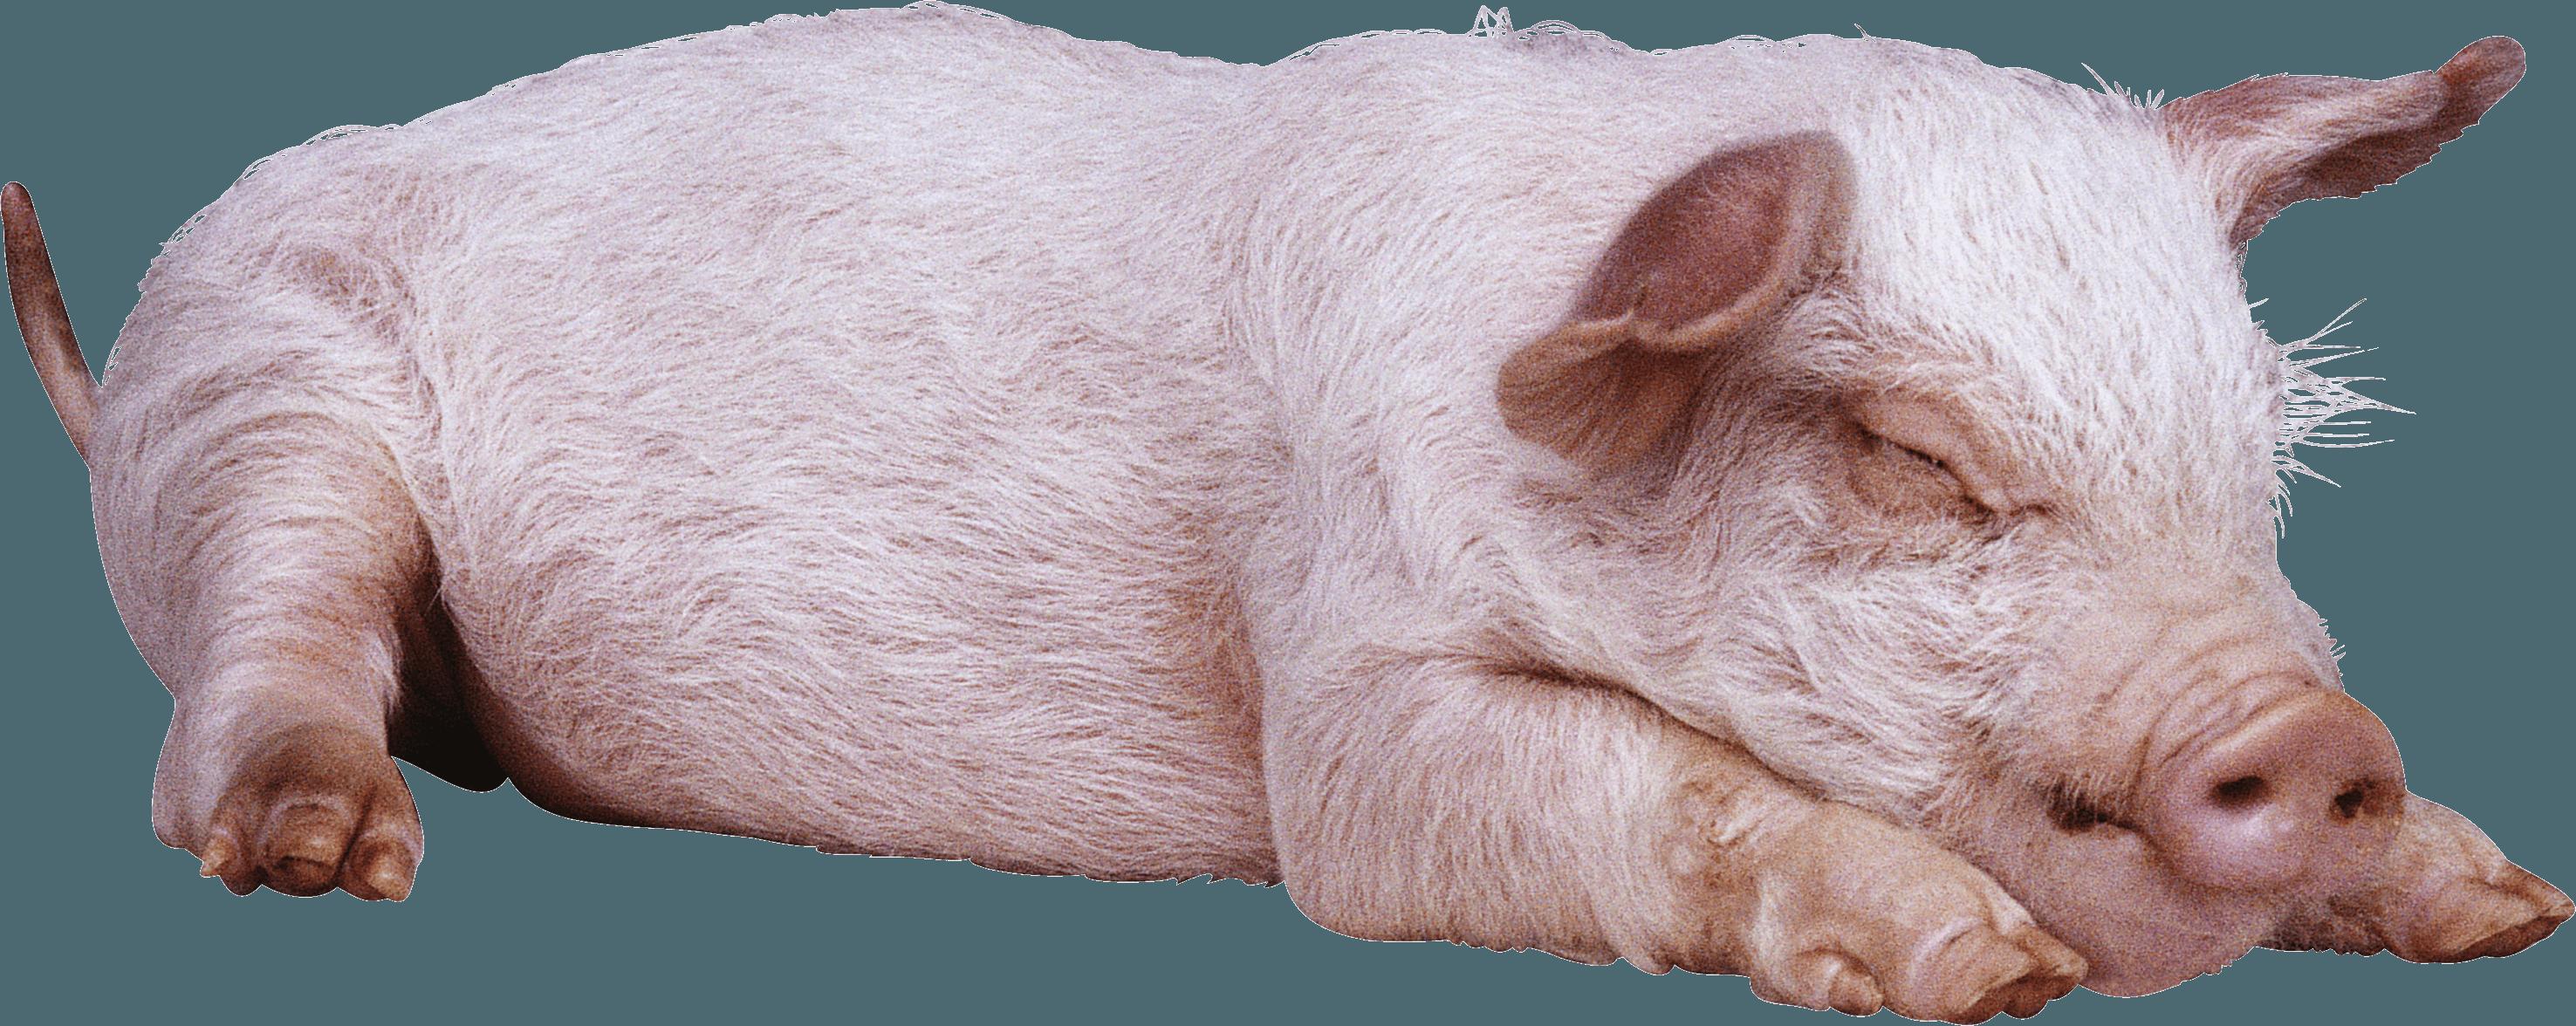 Pig Png Image Pig Png Pig Png